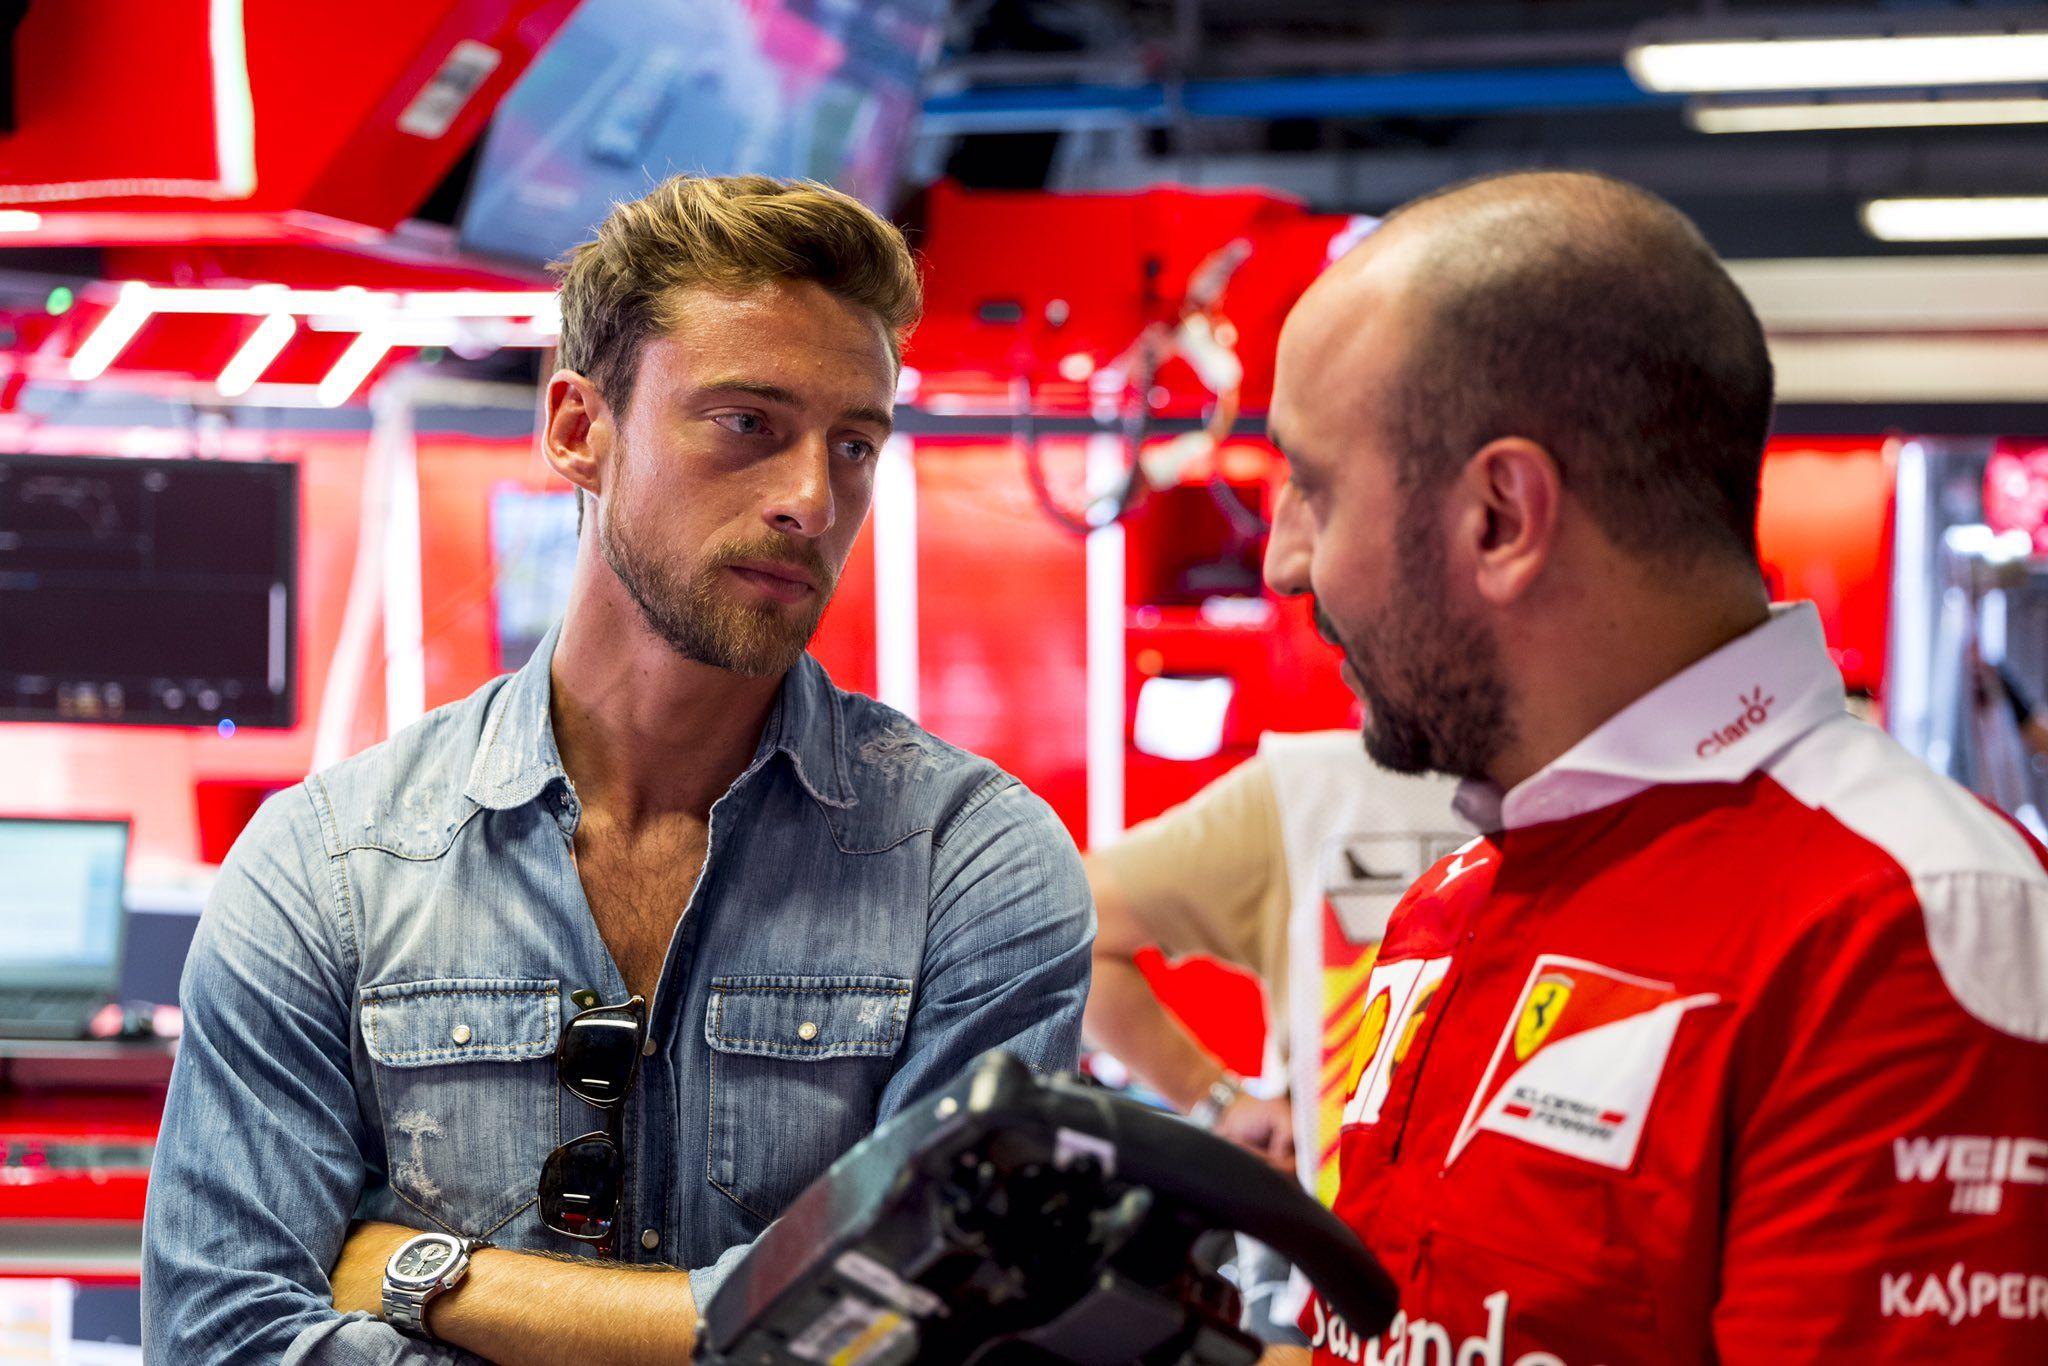 "Scuderia Ferrari on Twitter: "".@ClaMarchisio8 in our garage #ItalianGP #redseason https://t.co/Z8i8hARWnq"""